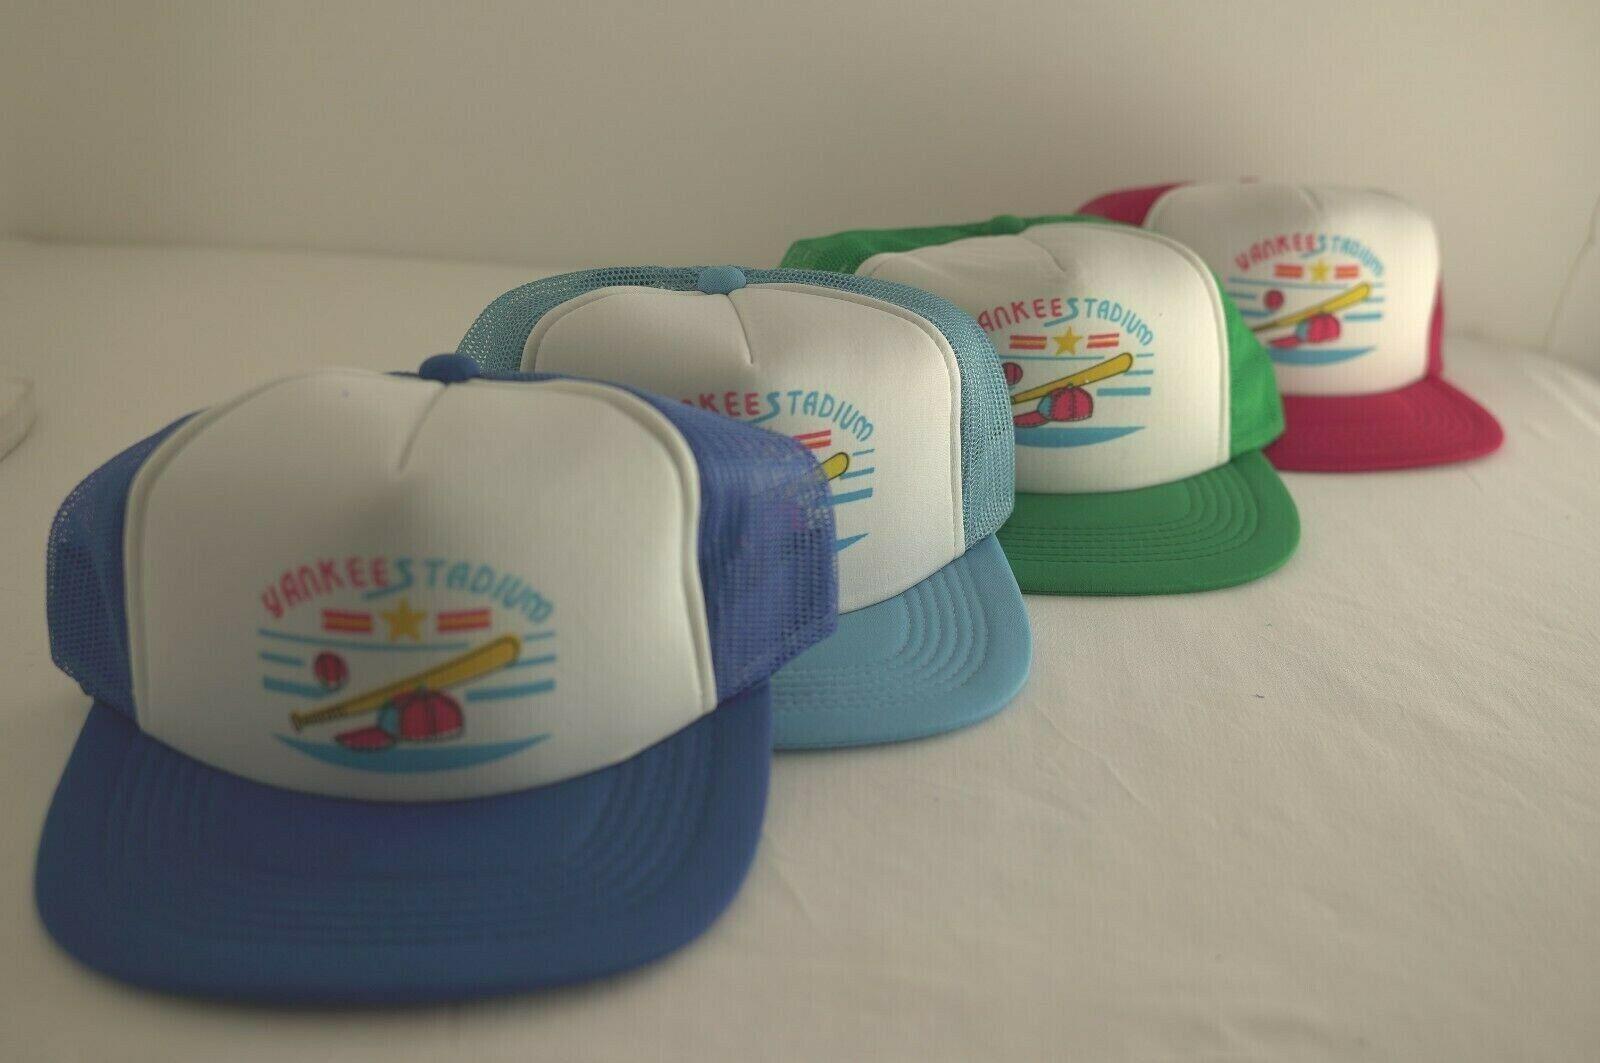 4 NEW Retro Mütze Sport Kappe Basecap Baseball Cap Unisex Vintage YANKEE STADIUM